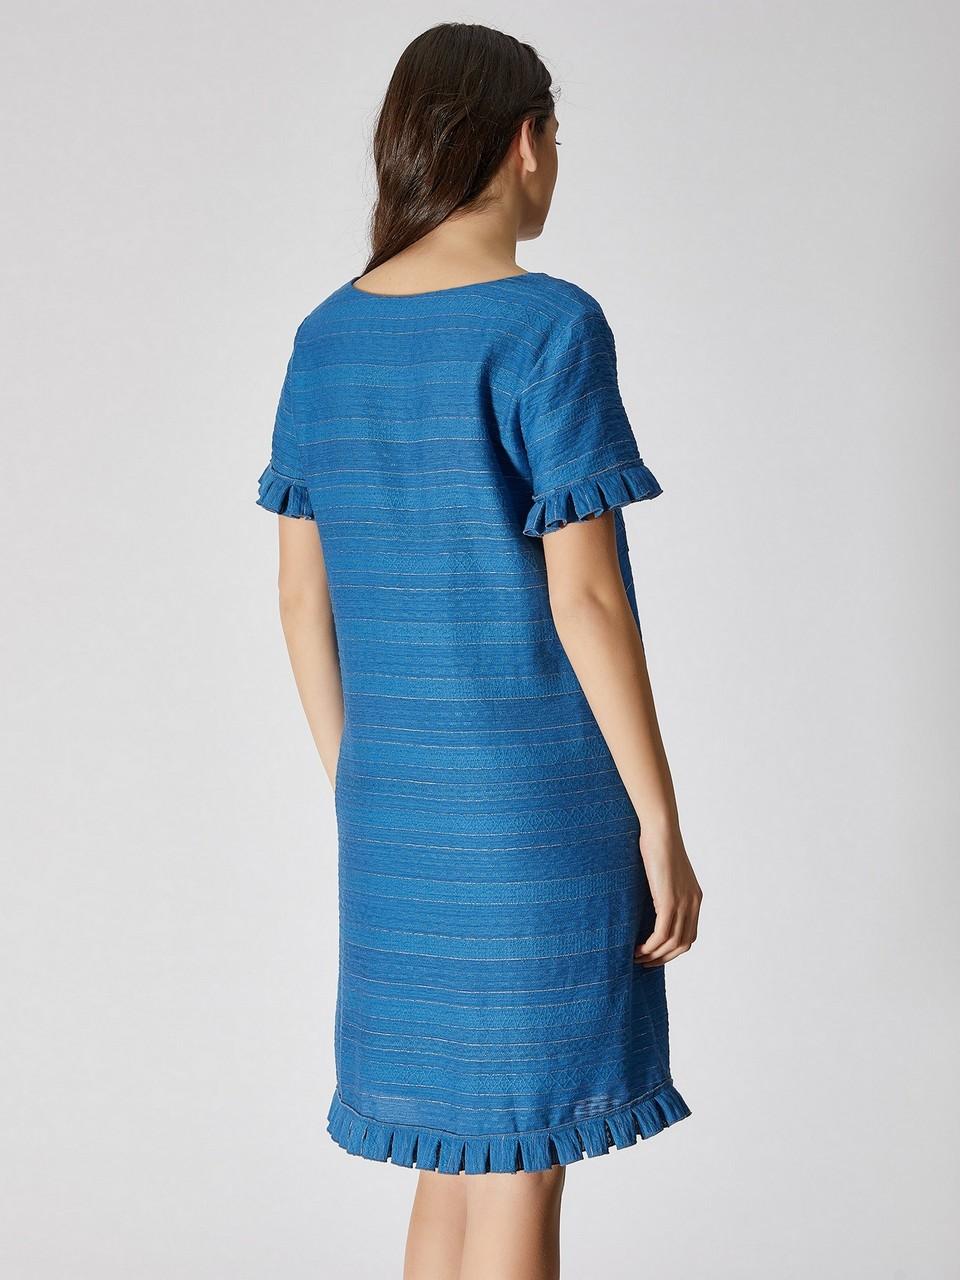 Fırfır Detaylı Rahat Kesim Elbise